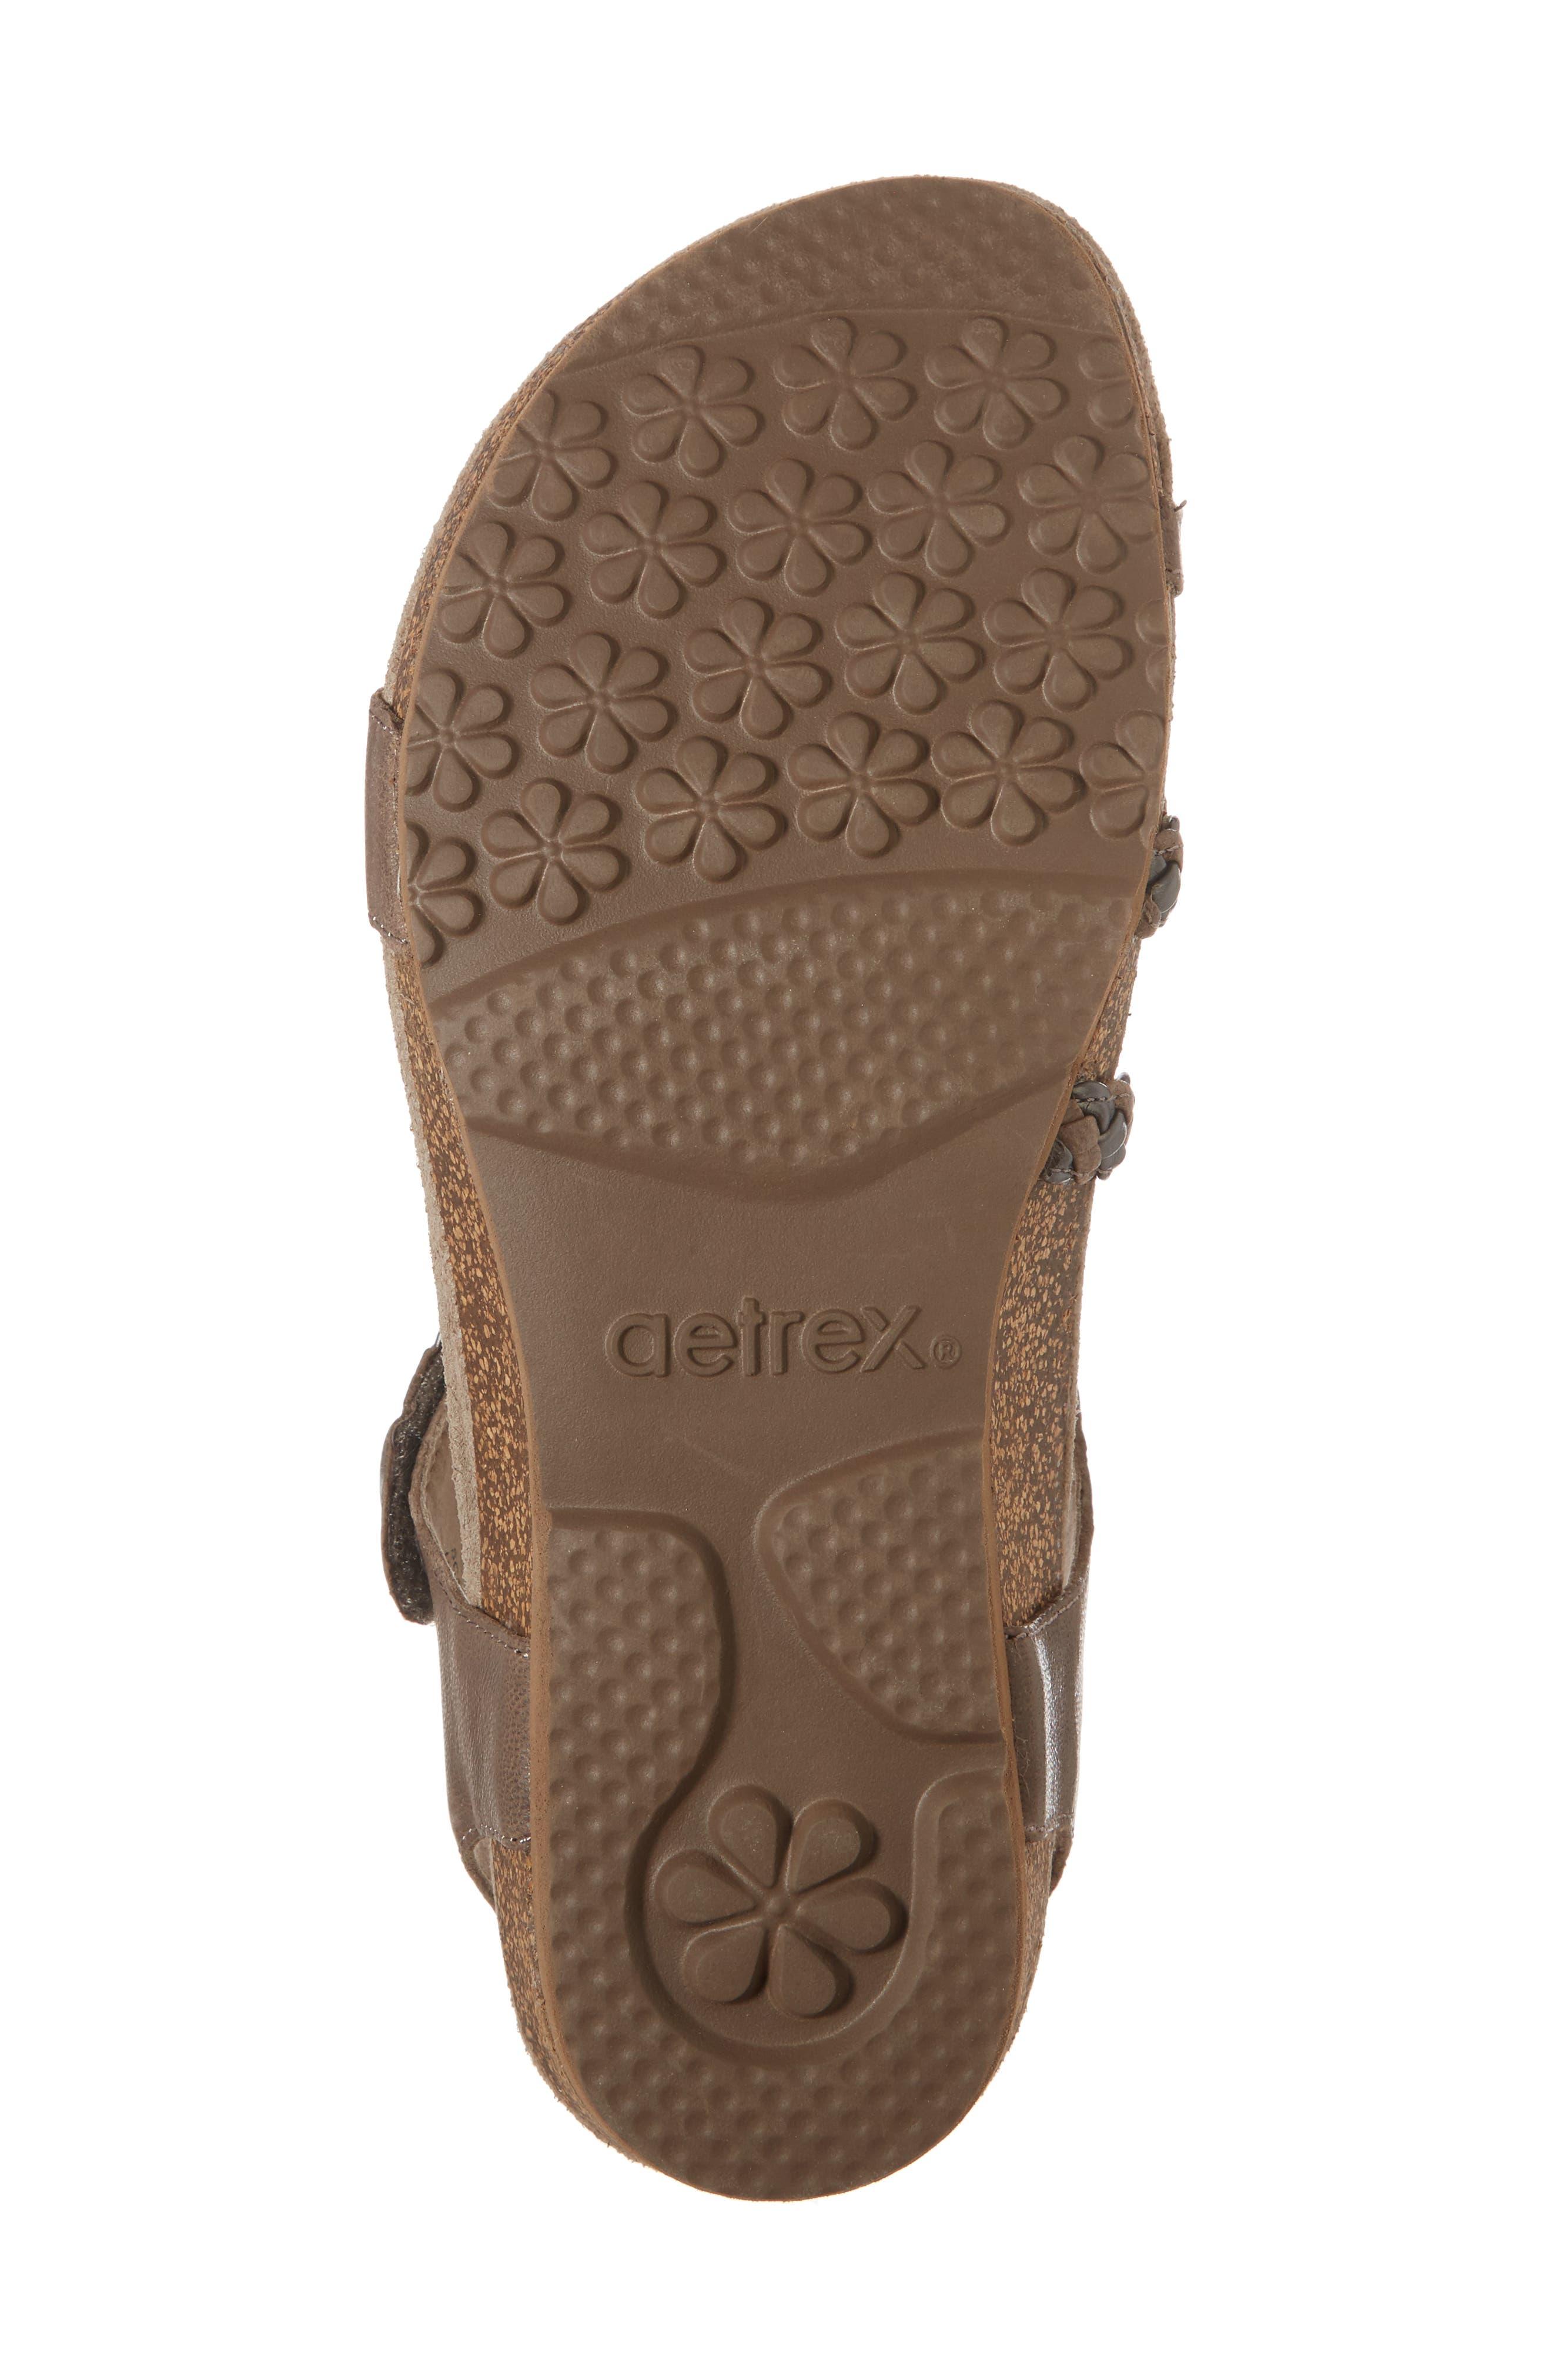 'Jillian' Braided Leather Strap Sandal,                             Alternate thumbnail 6, color,                             GREY LEATHER